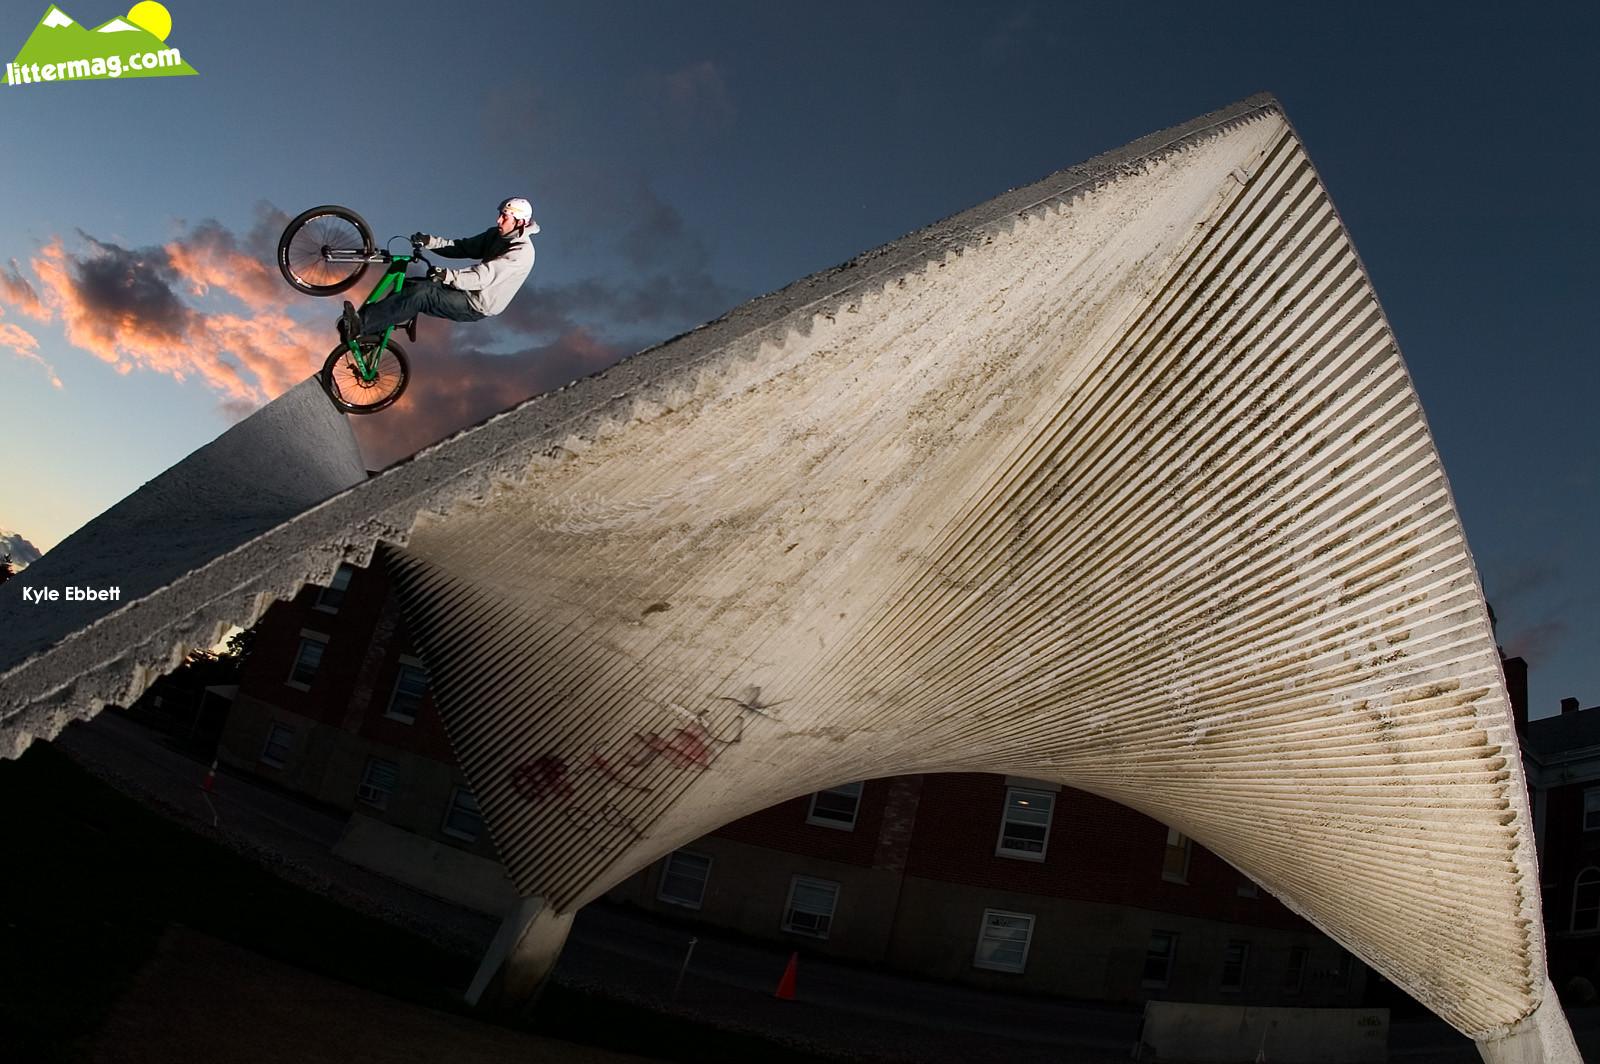 Kyle Ebbett, Roof Tap - Freeride Wallpapers - Mountain Biking Pictures - Vital MTB